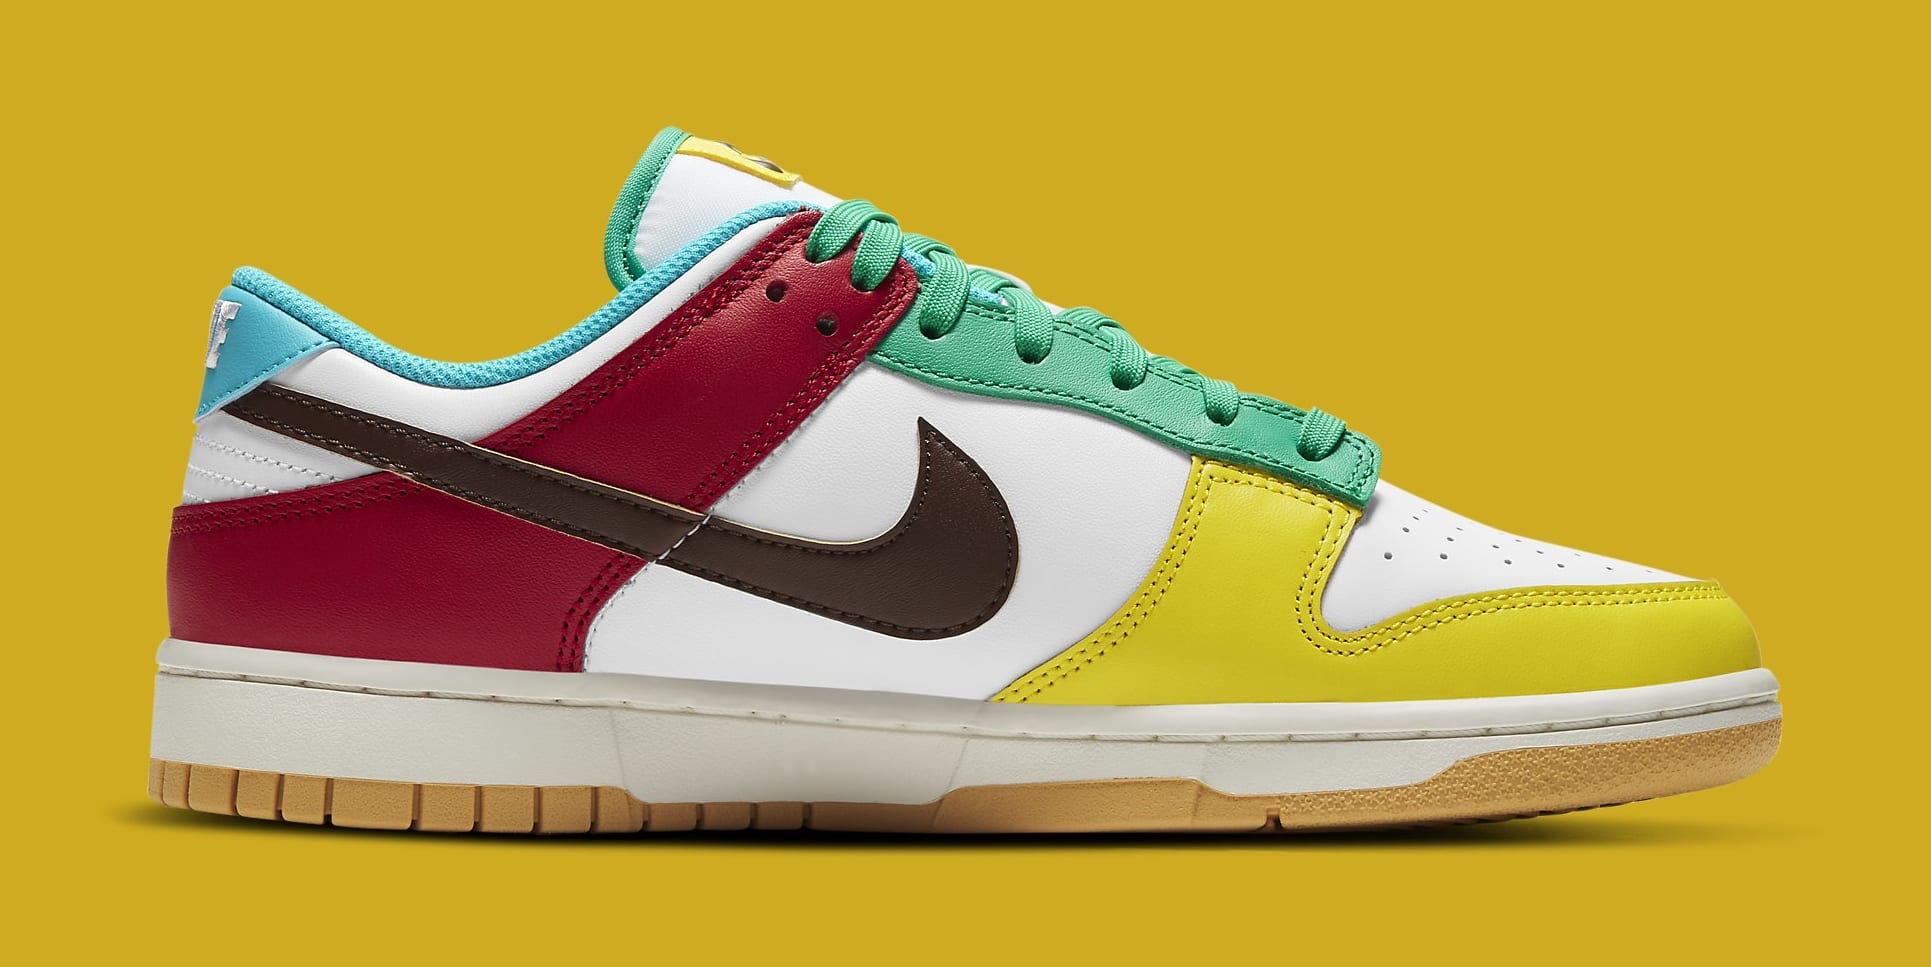 Nike Dunk Low 'Free.99 White' DH0952-100 Medial